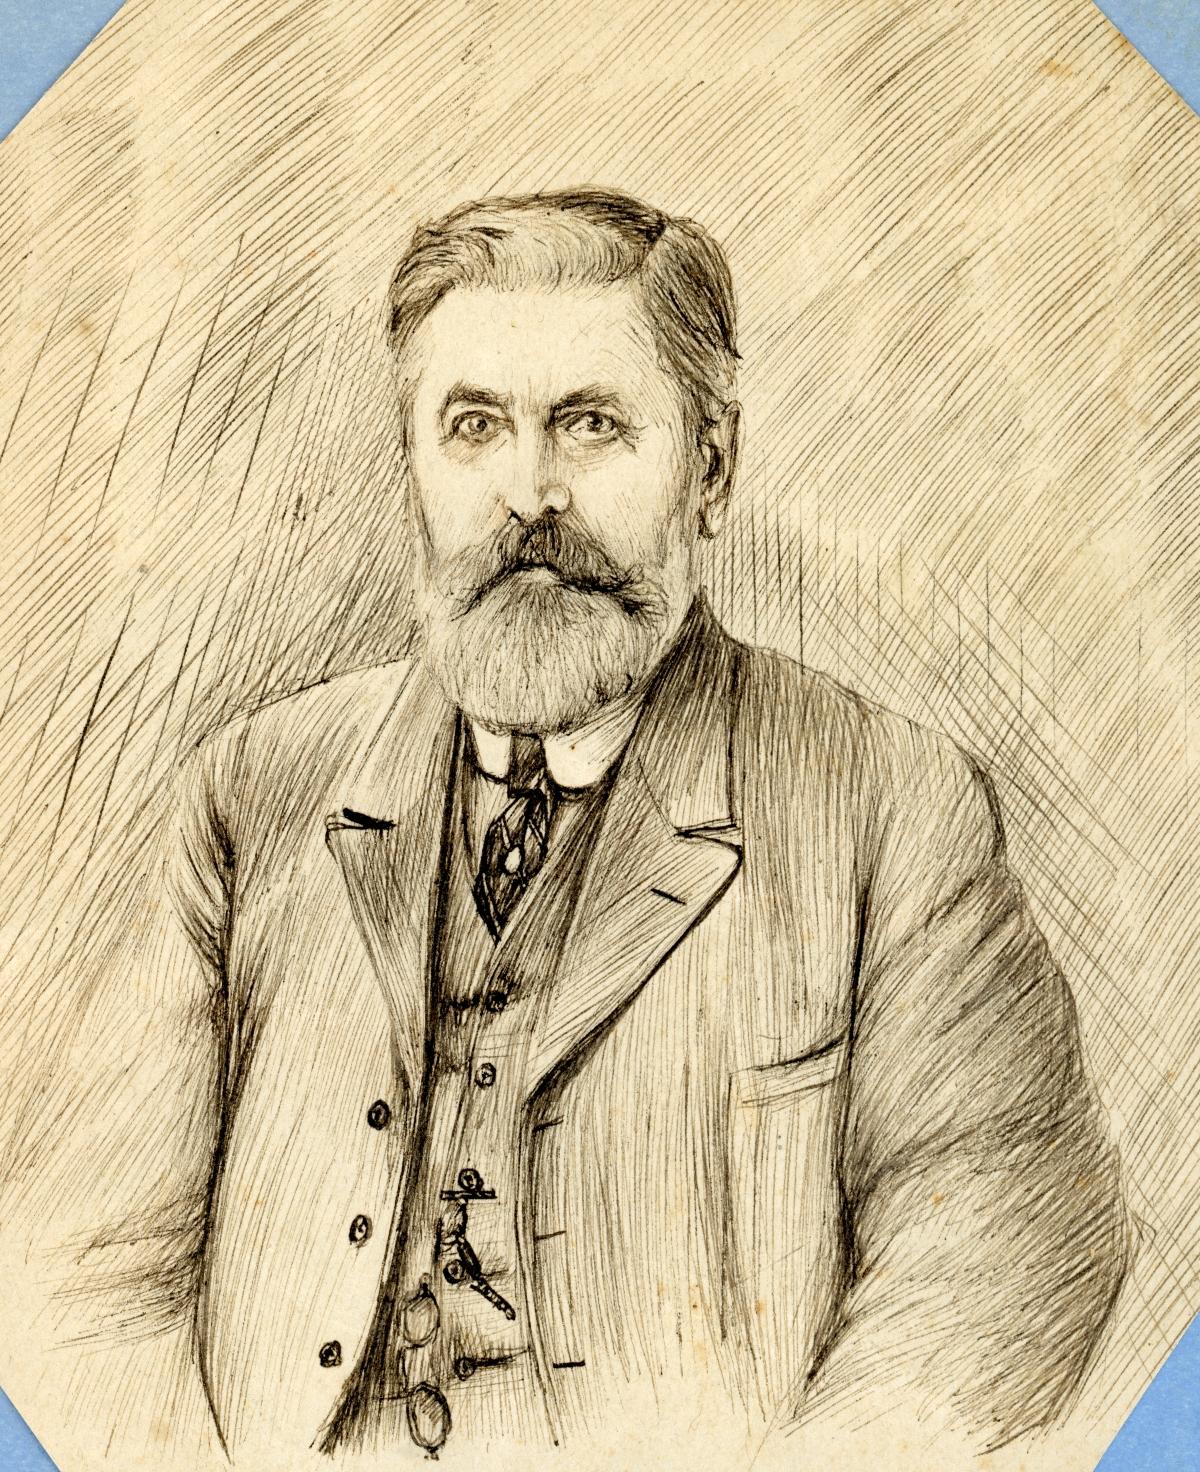 Drawn portrait of vintner Emile DuBois - Tallahassee, Florida.